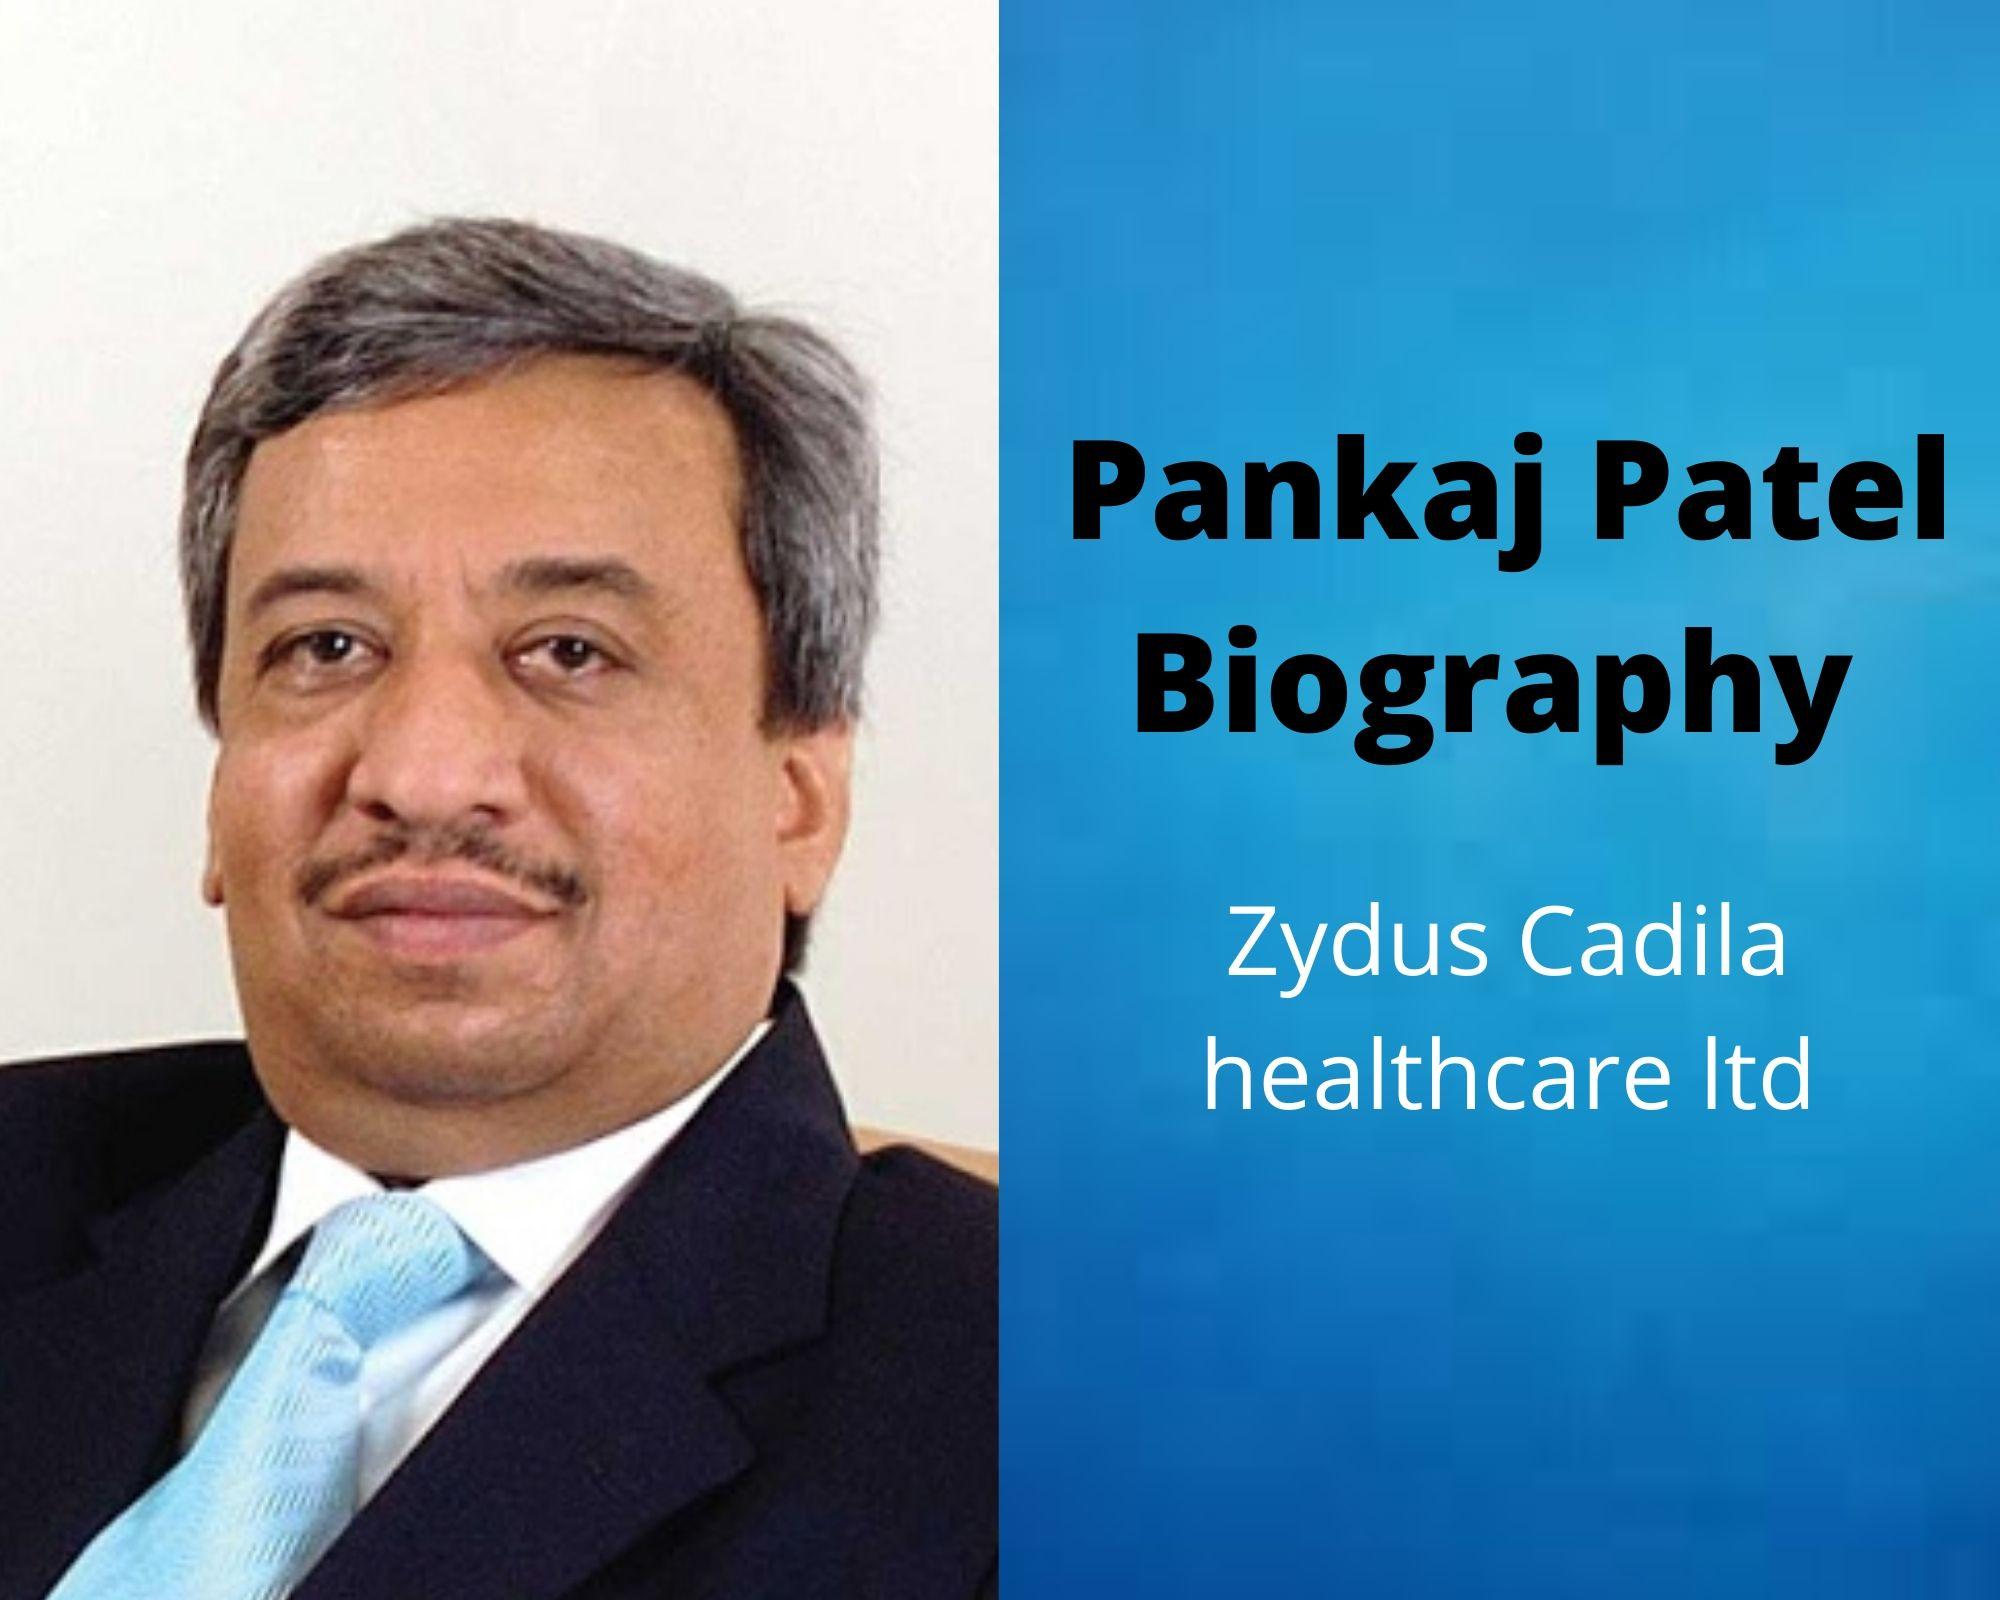 Pankaj Patel Biography